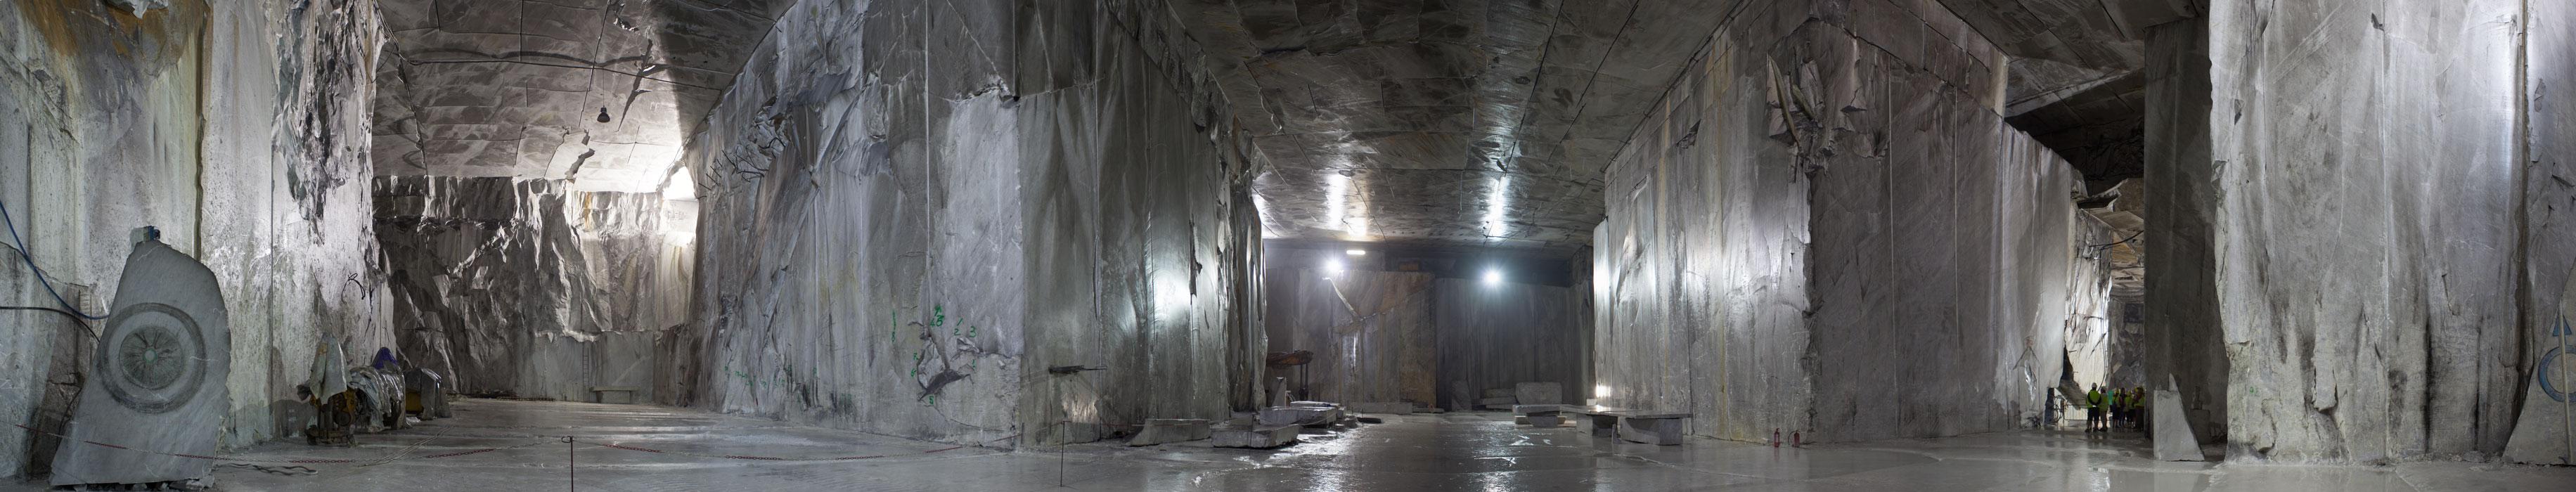 Fantiscritti_Cave_Panorama1